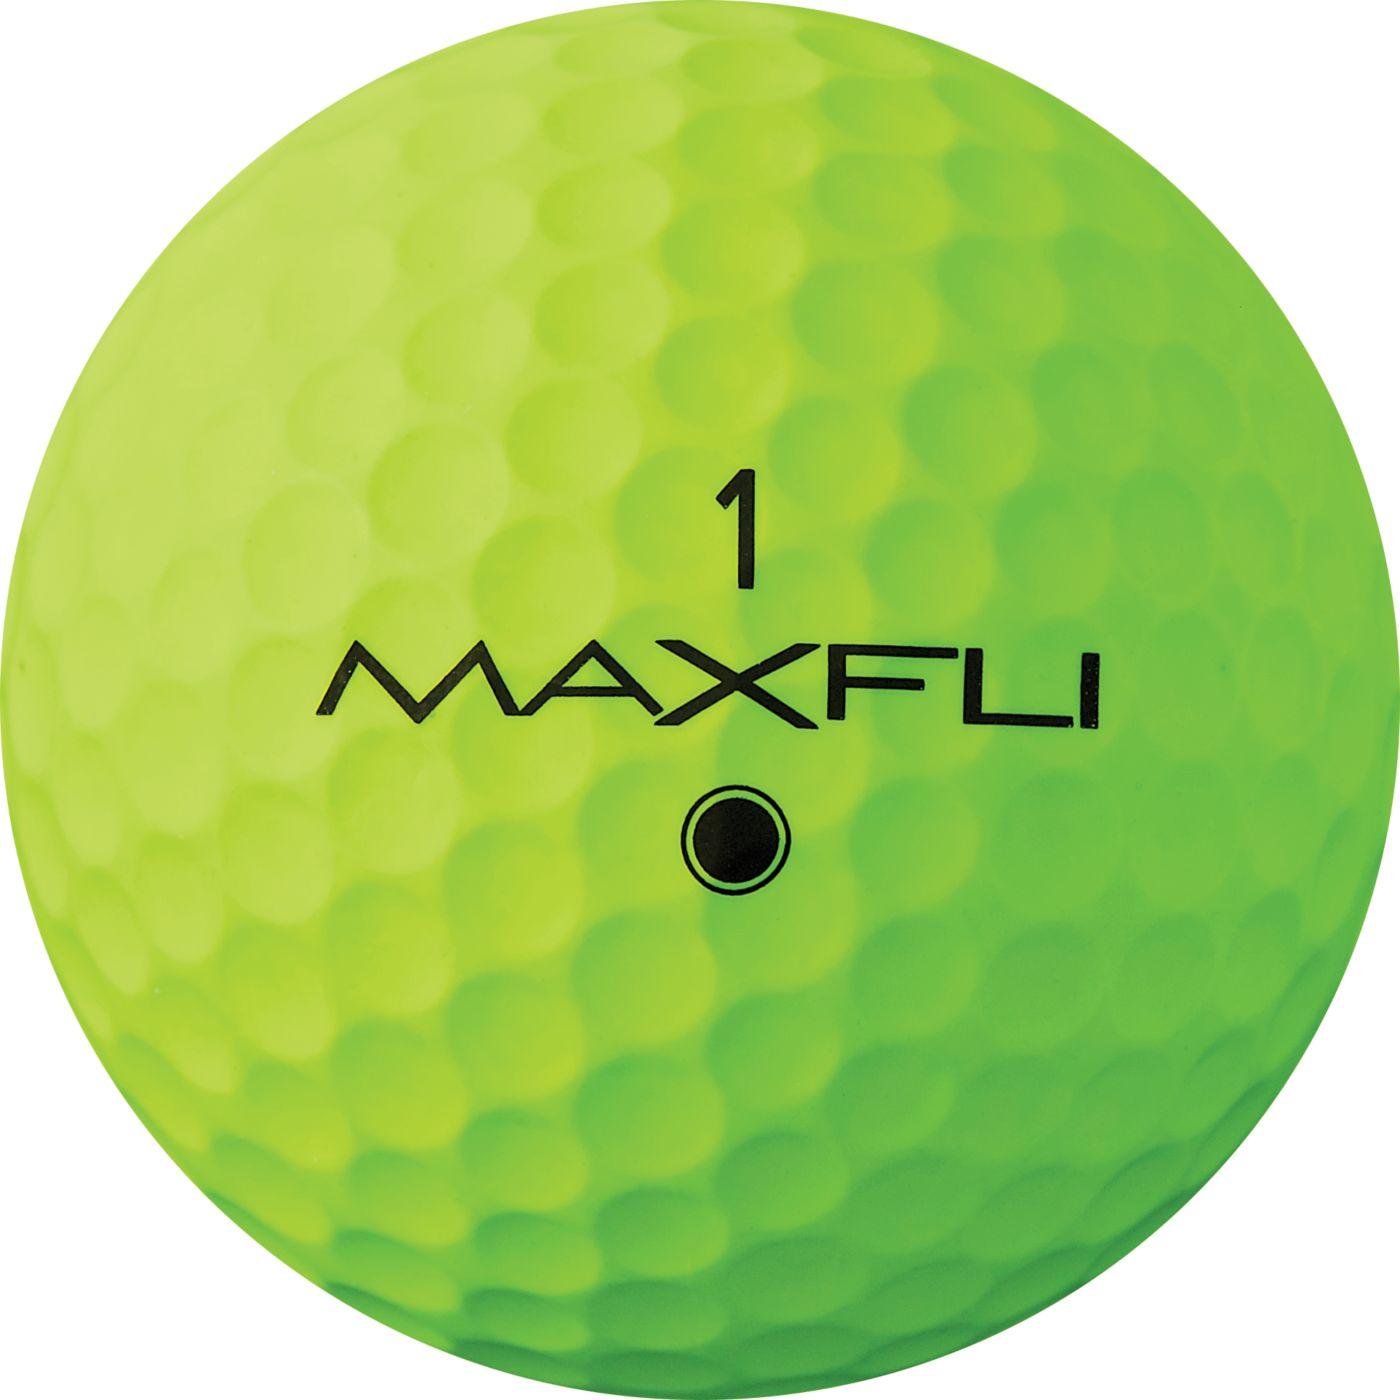 Maxfli 2019 Tour Matte Green Personalized Golf Balls